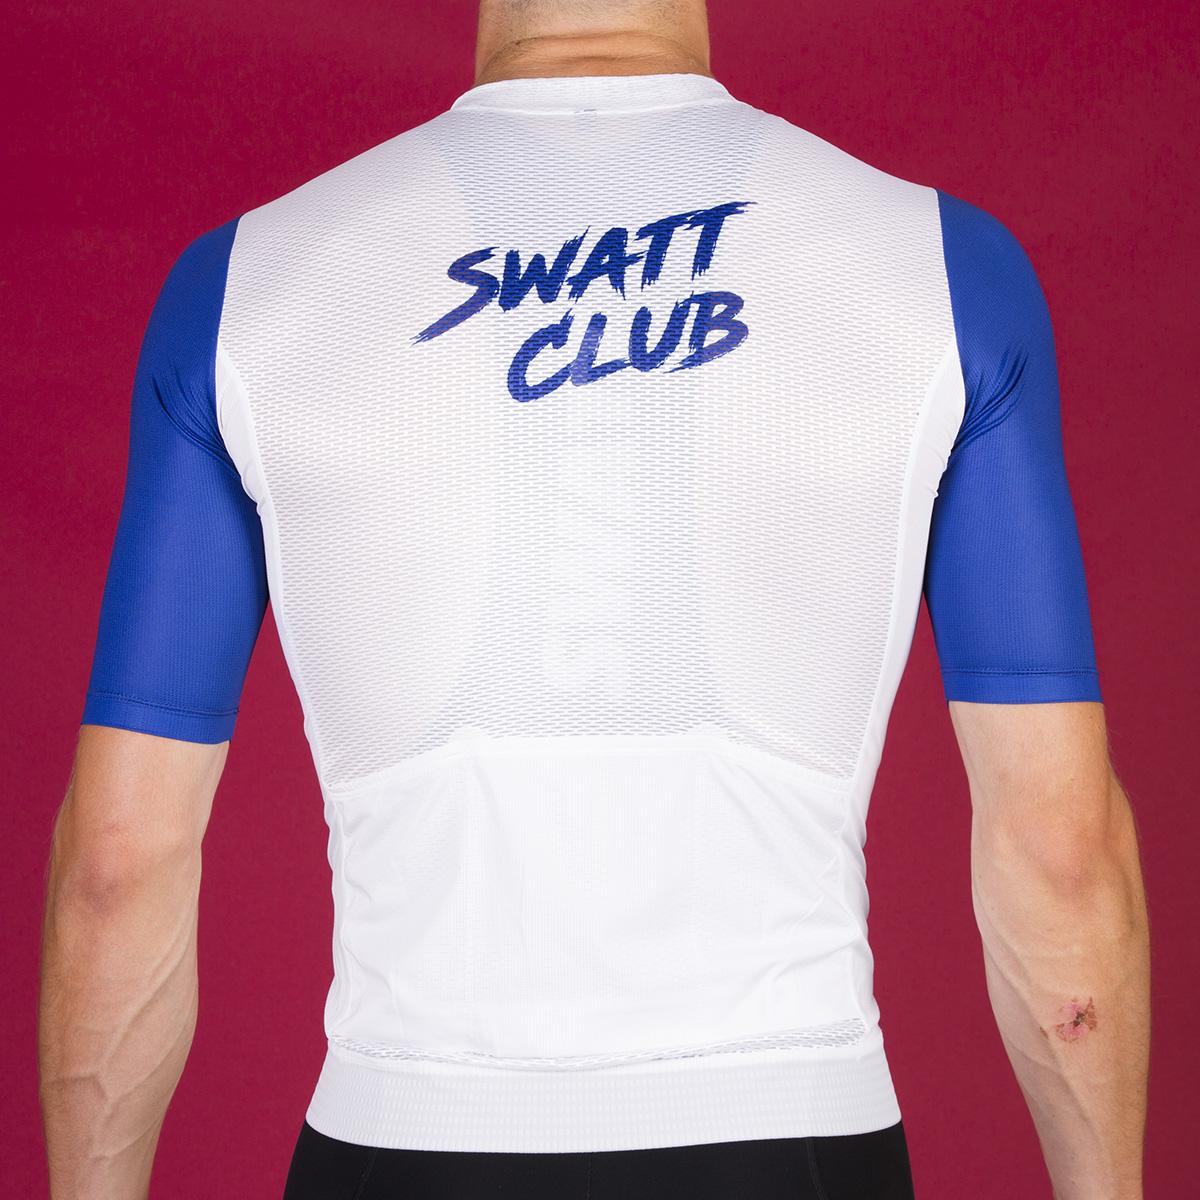 80s cycling jersey swatt club